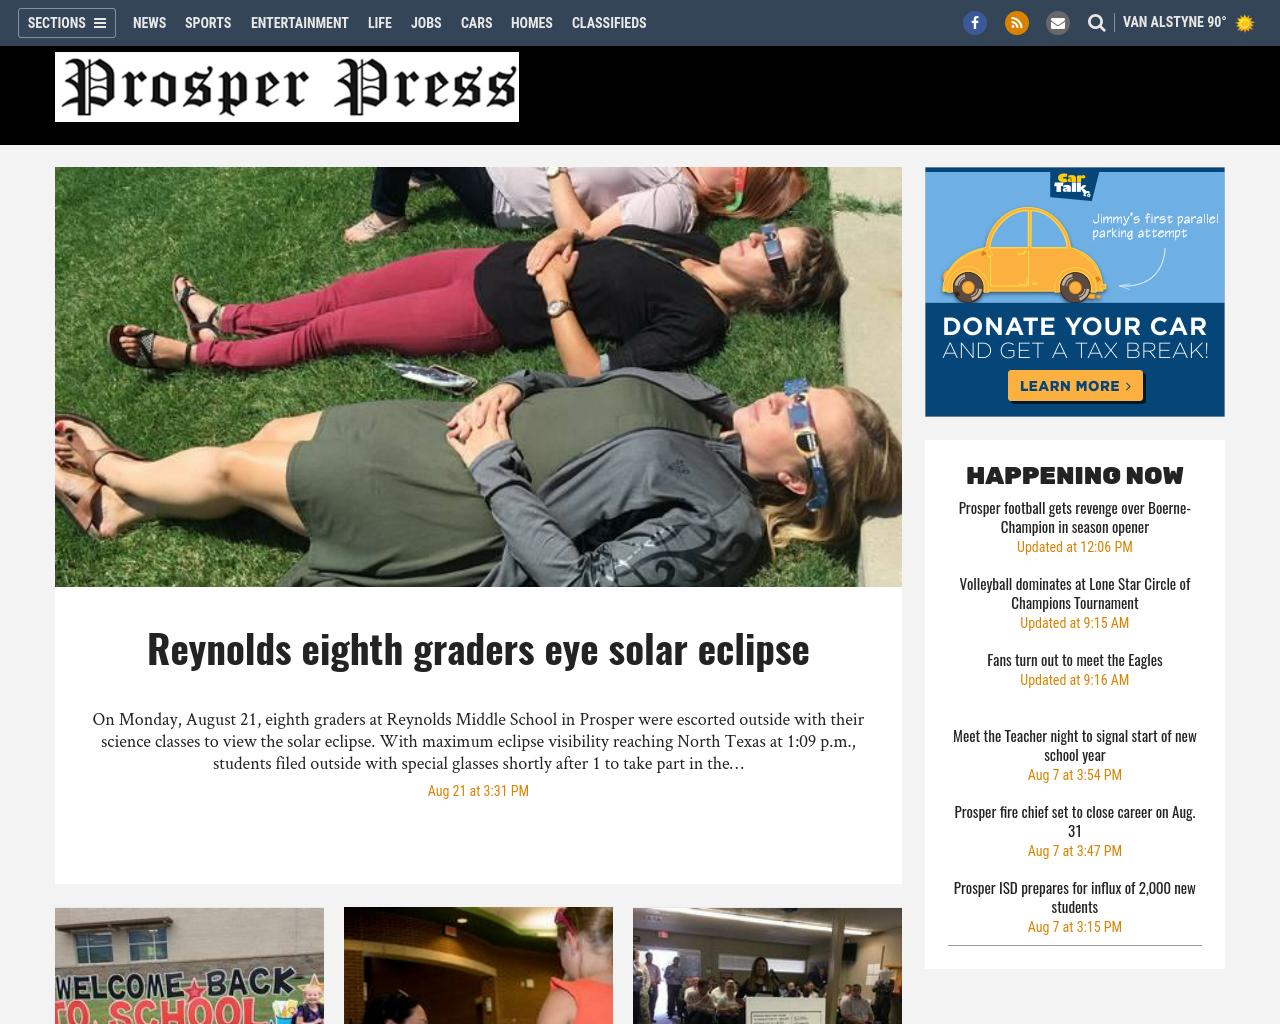 Prosper-Press-News-Advertising-Reviews-Pricing